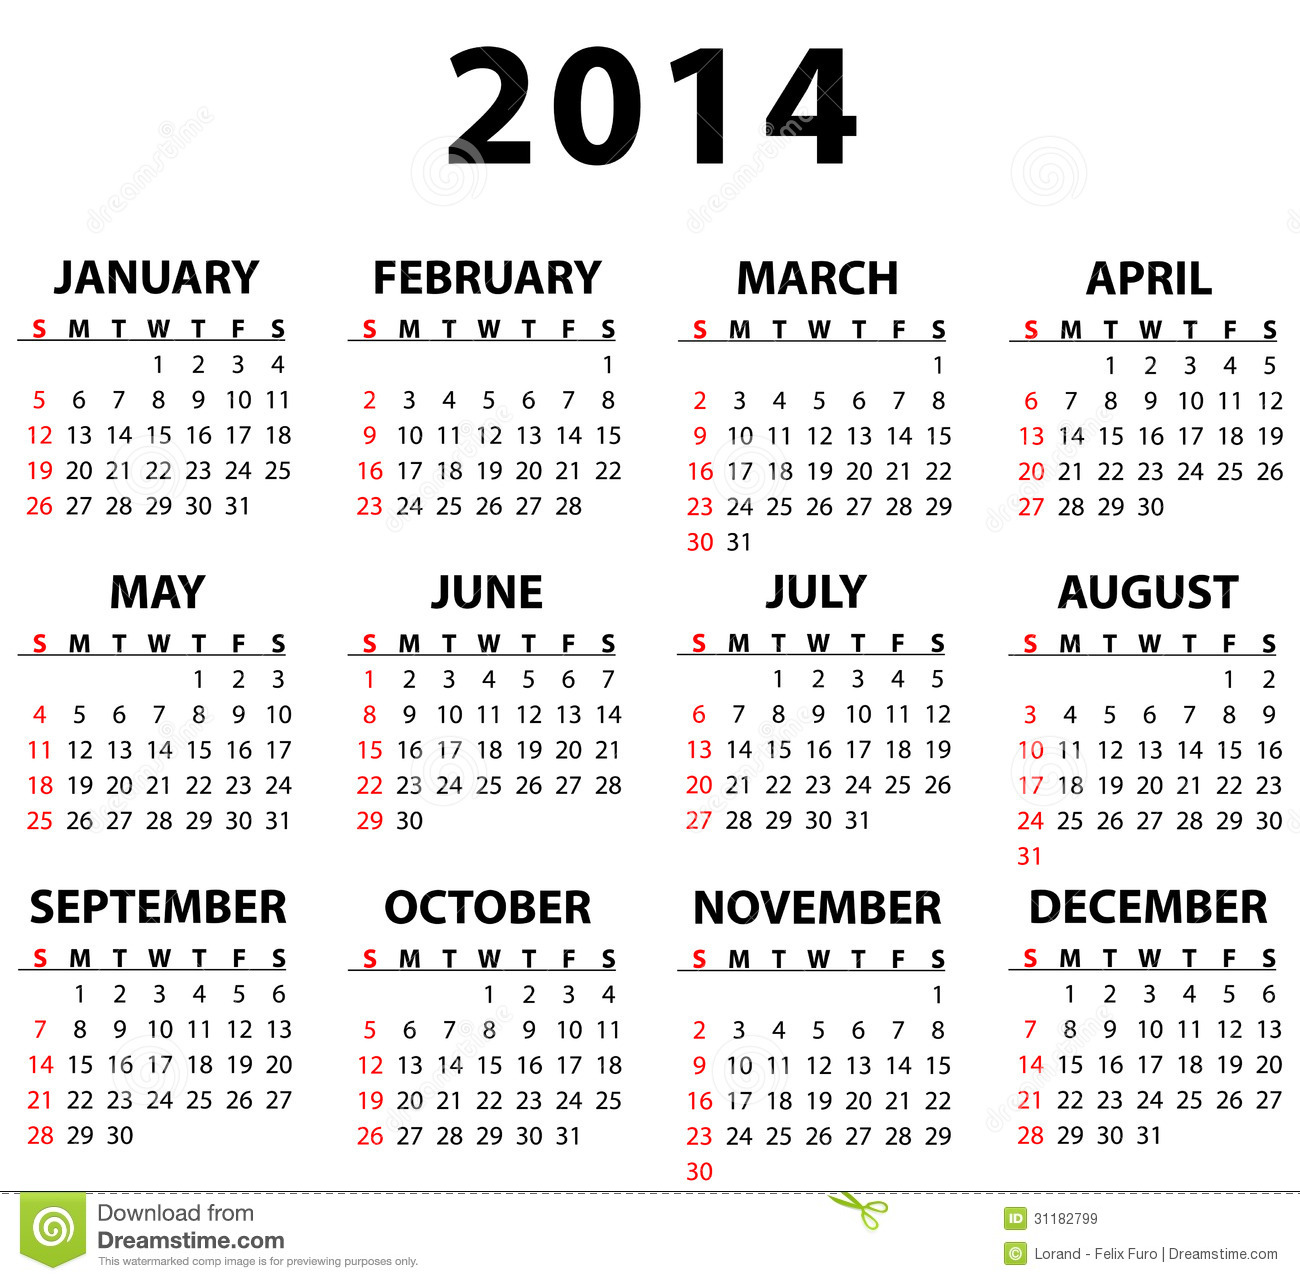 2014 >> 2014 A Critical Year For Our Movement David Duke Com